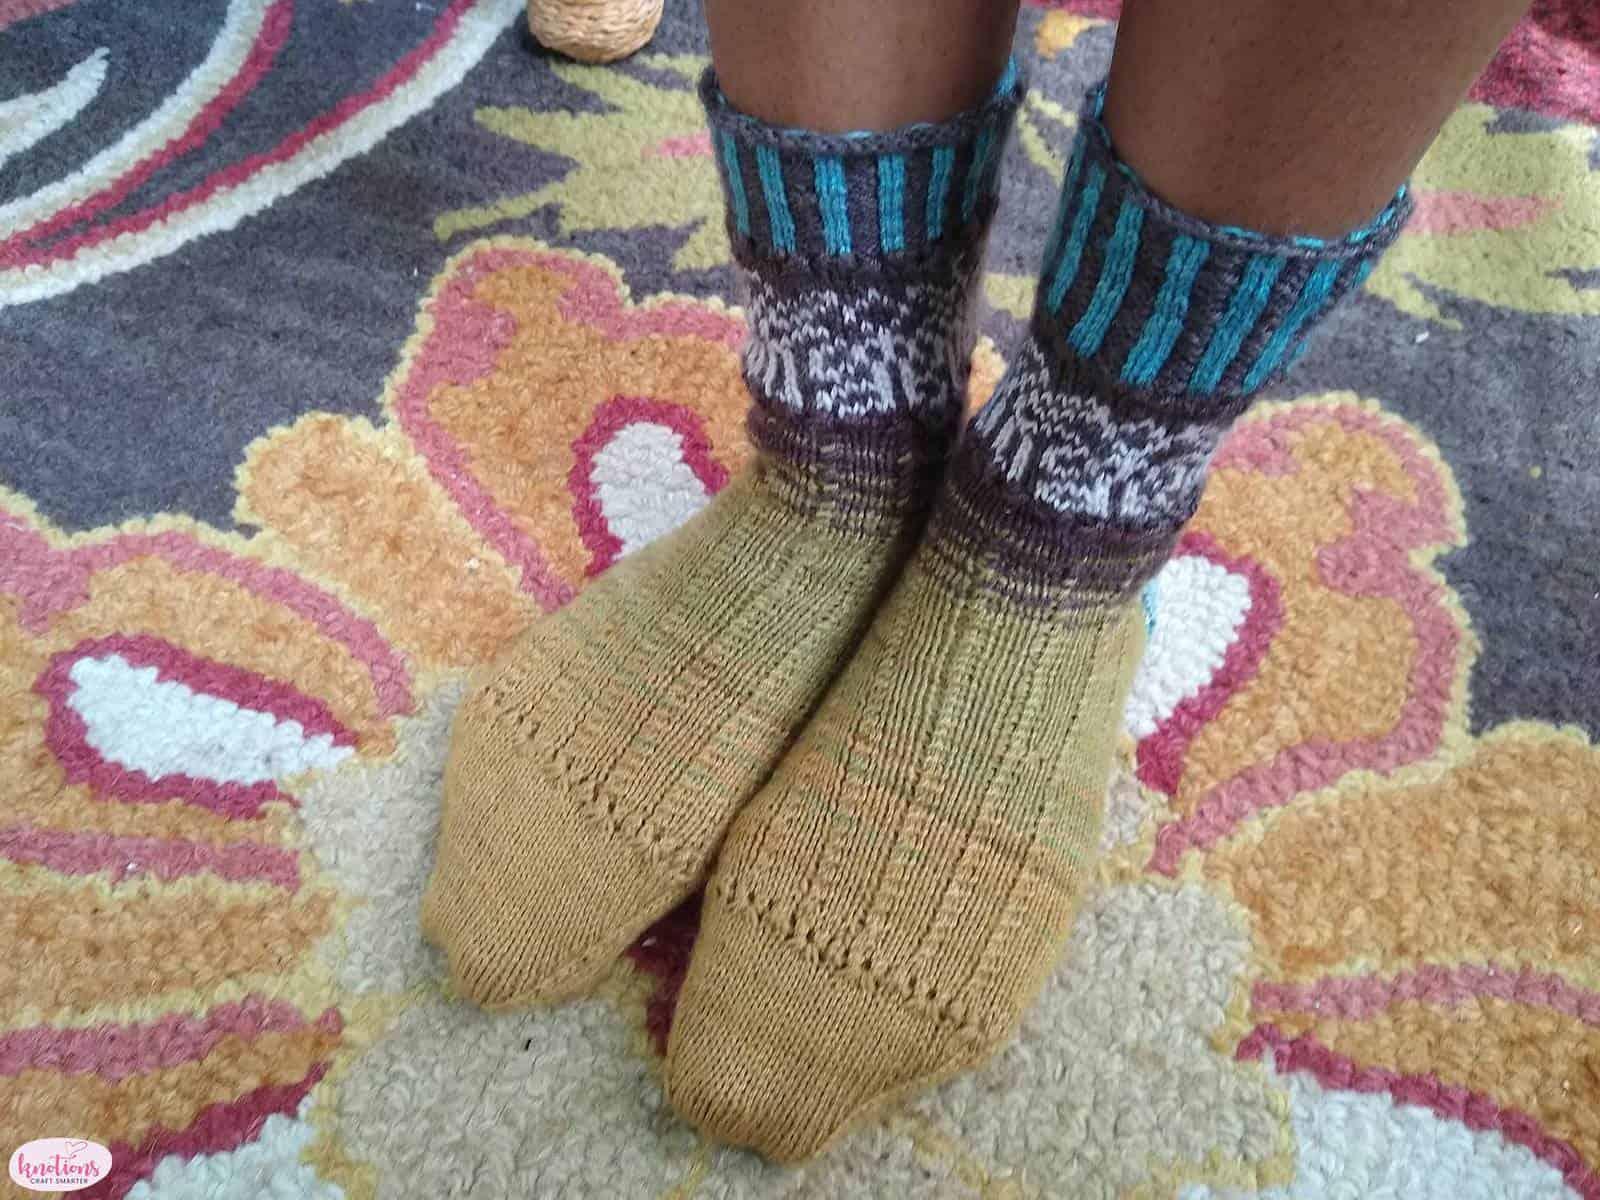 carved-wood-socks-6